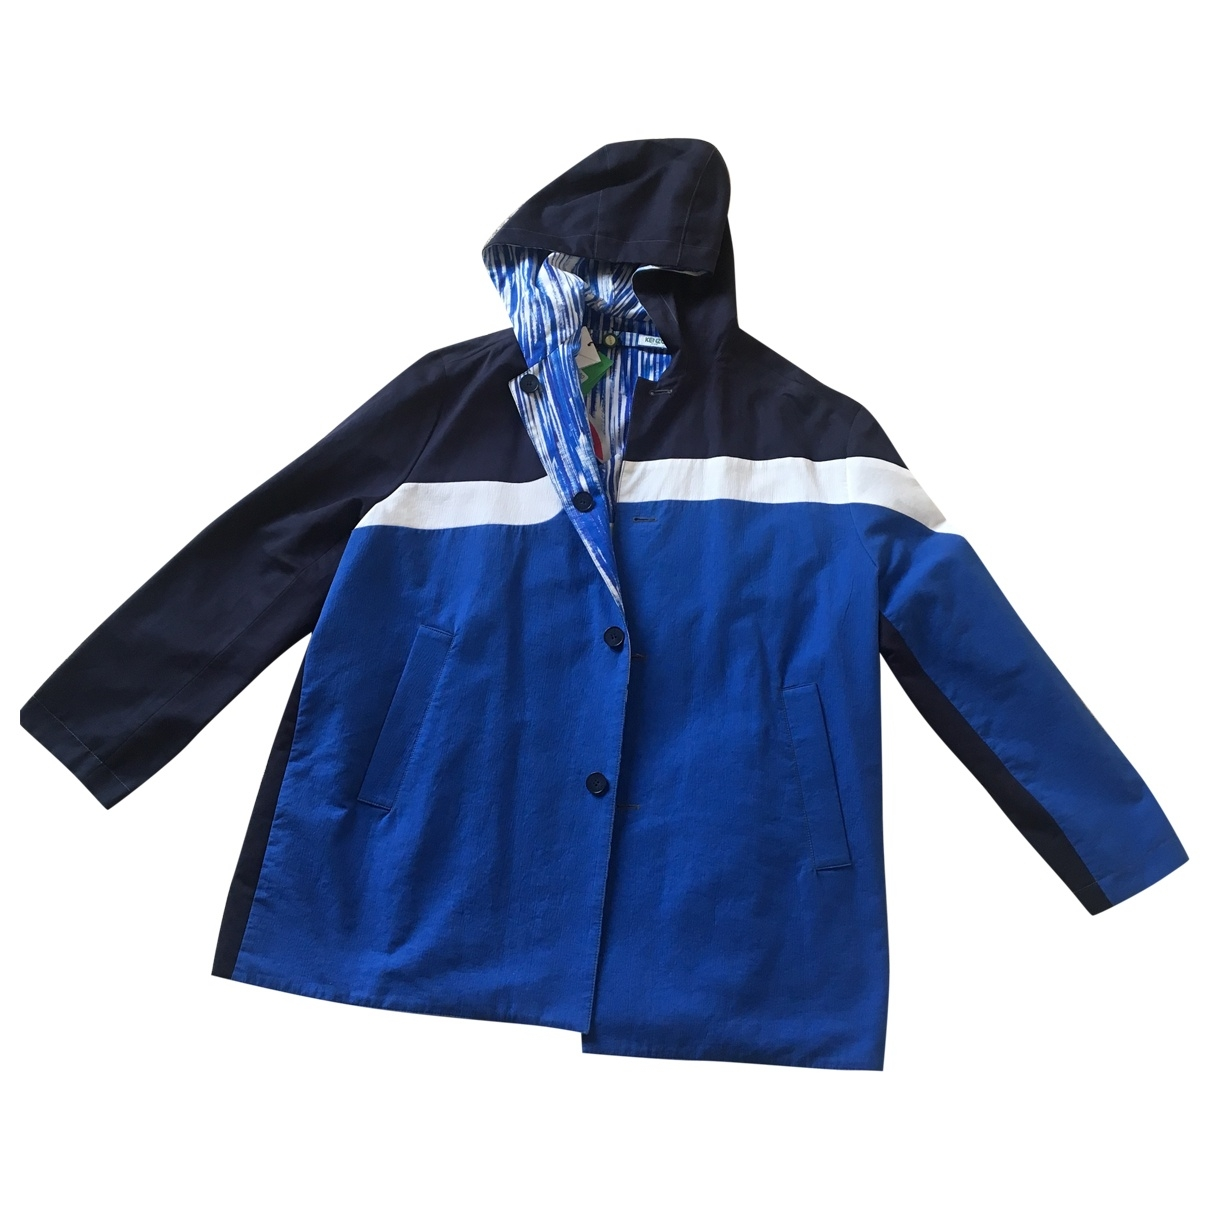 Kenzo \N Blue Cotton jacket  for Men S